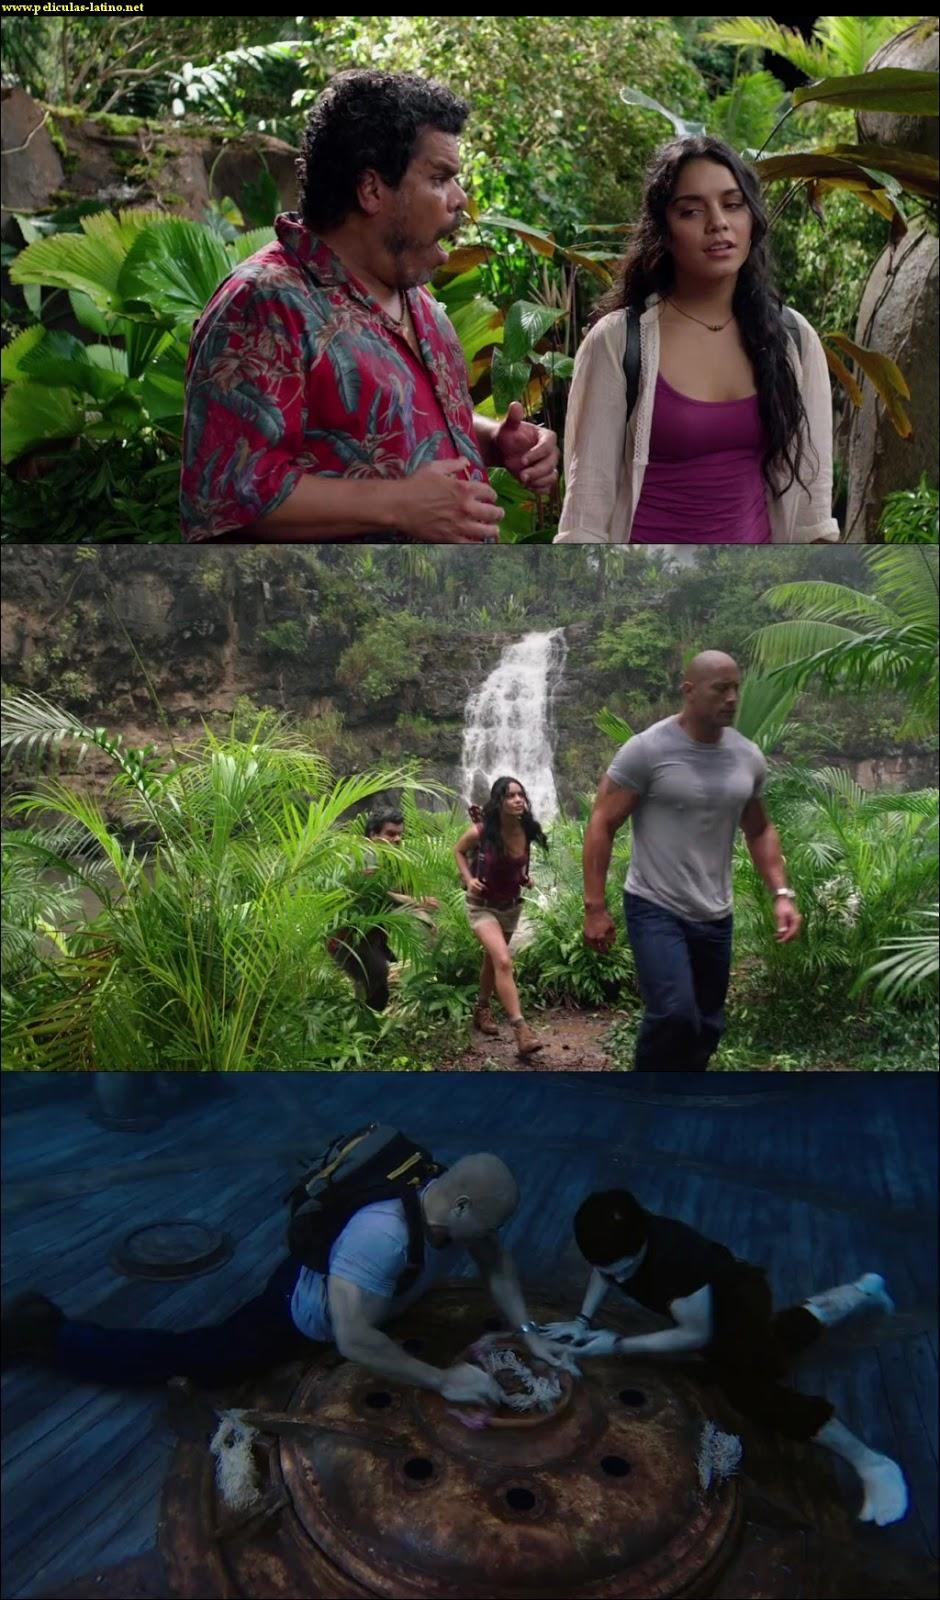 Imagen 1 Viaje 2: La Isla Misteriosa película HD 720p latino